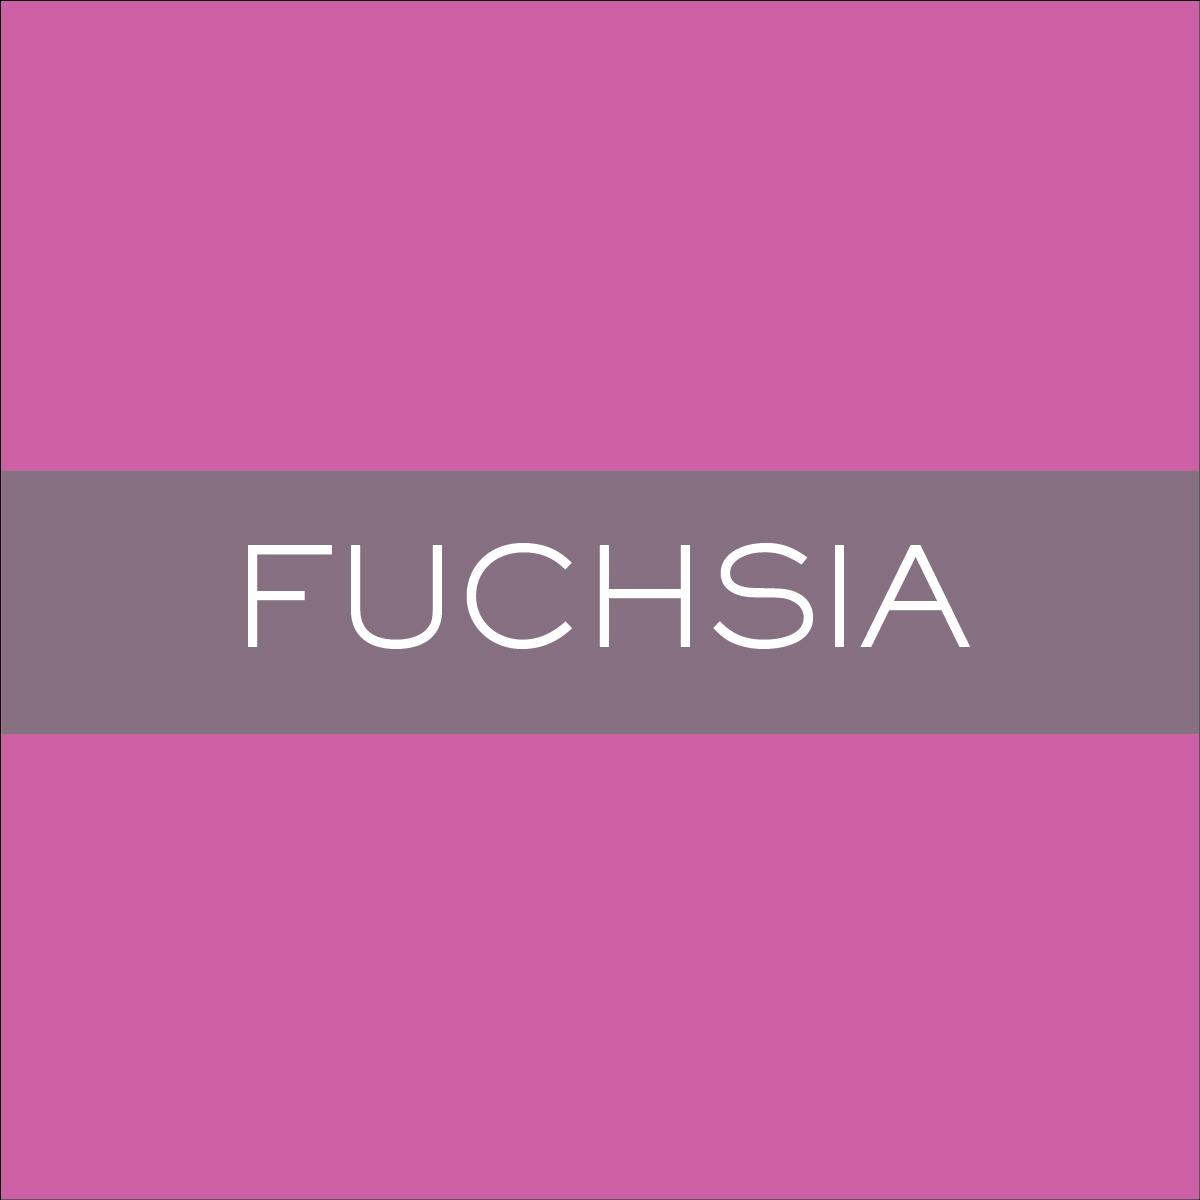 INK_Fuchsia.jpg